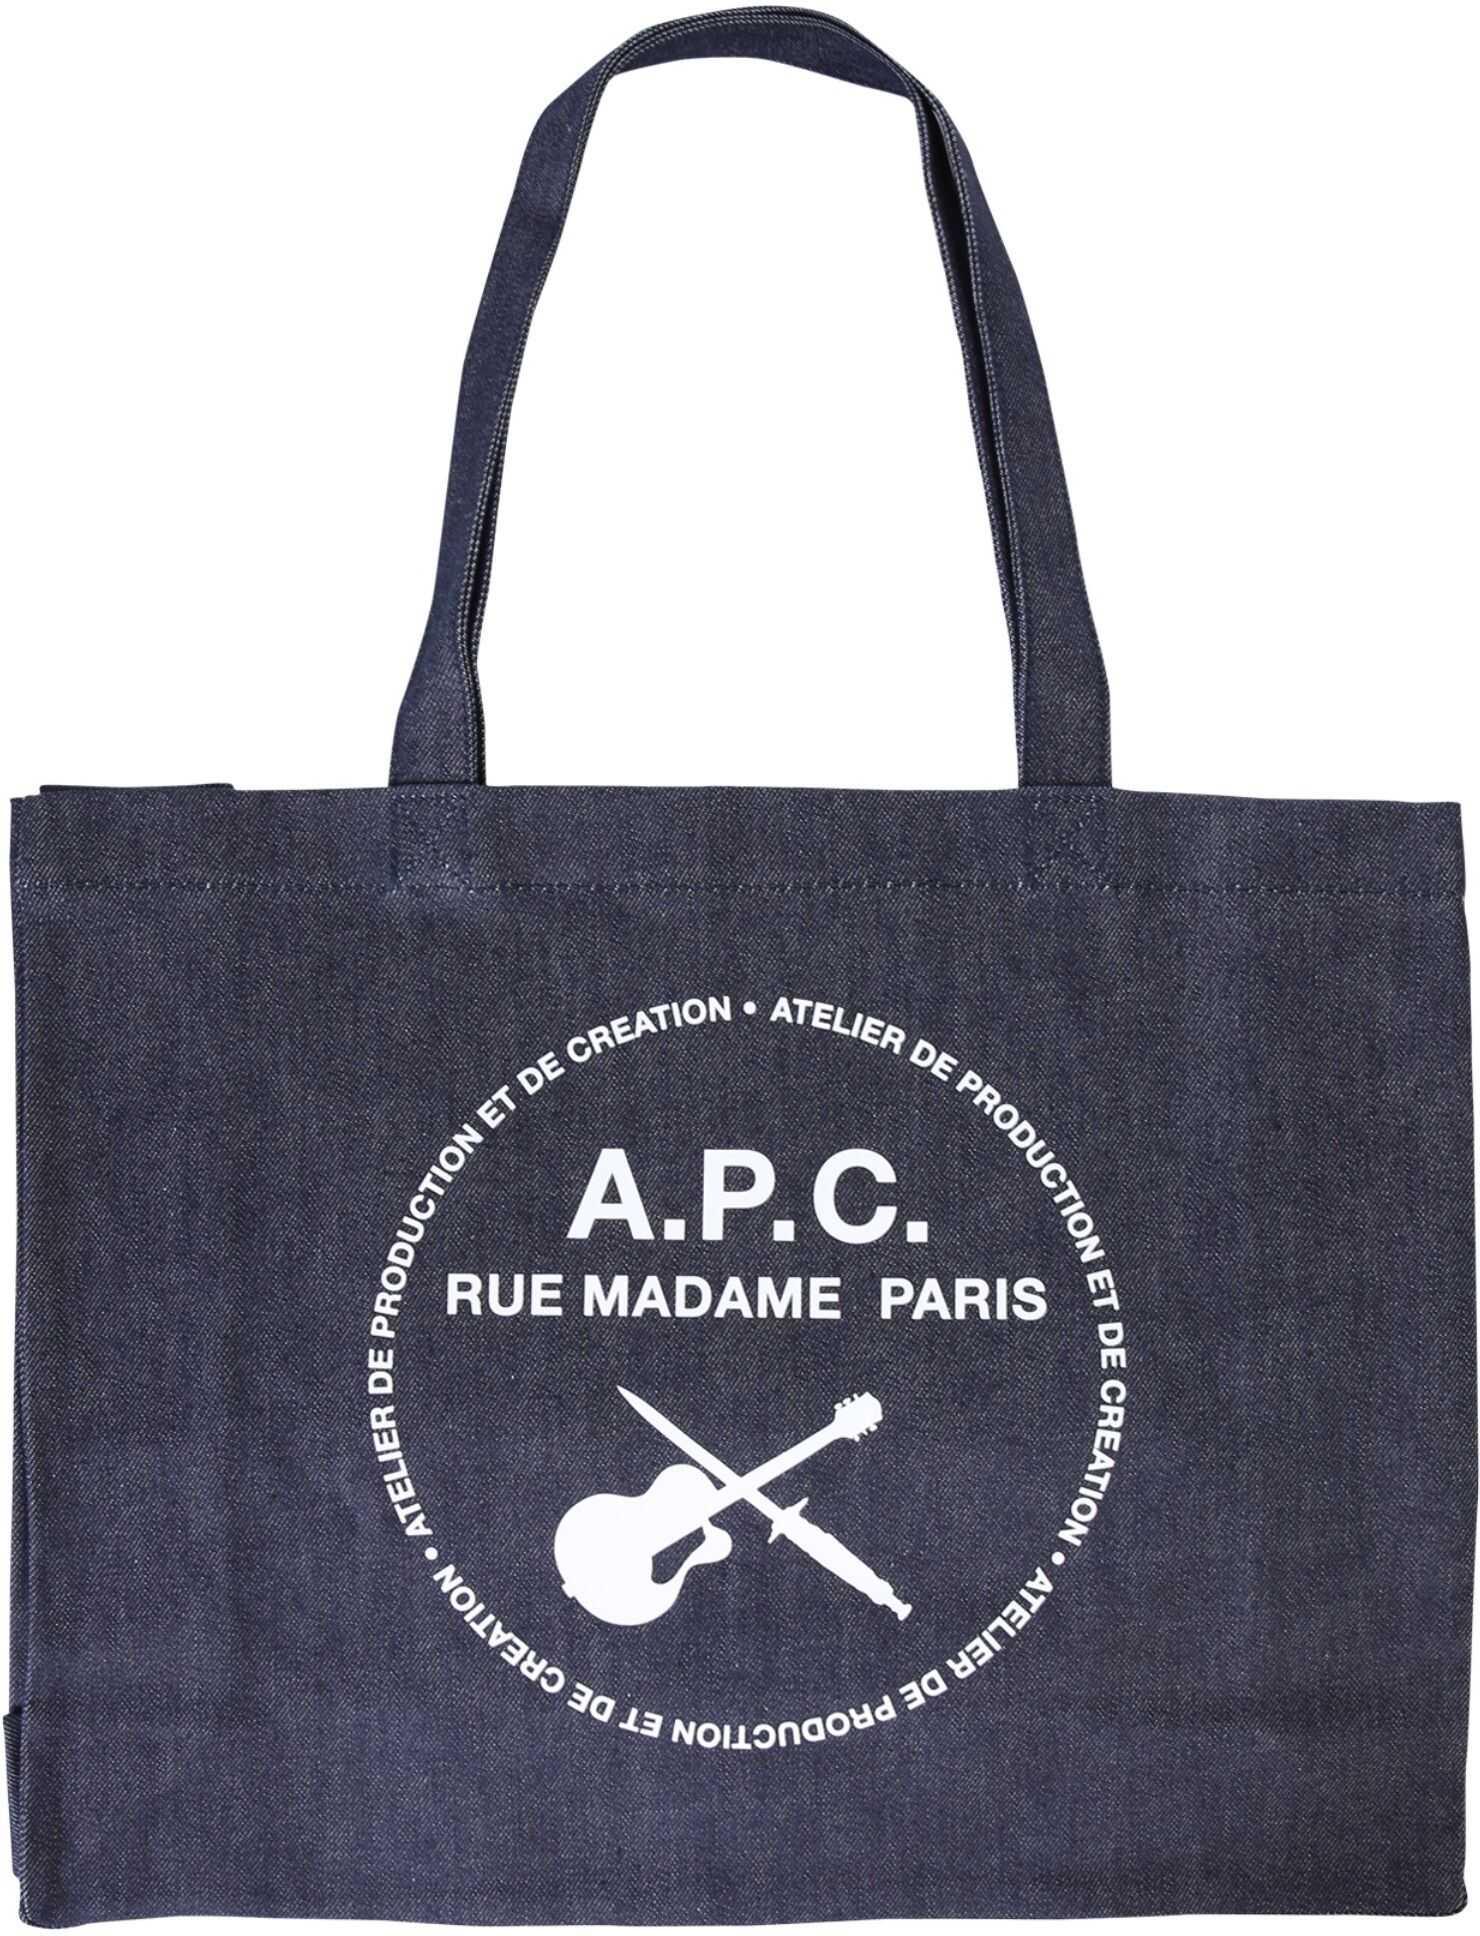 A.P.C. Shopping Bag With Logo BLUE